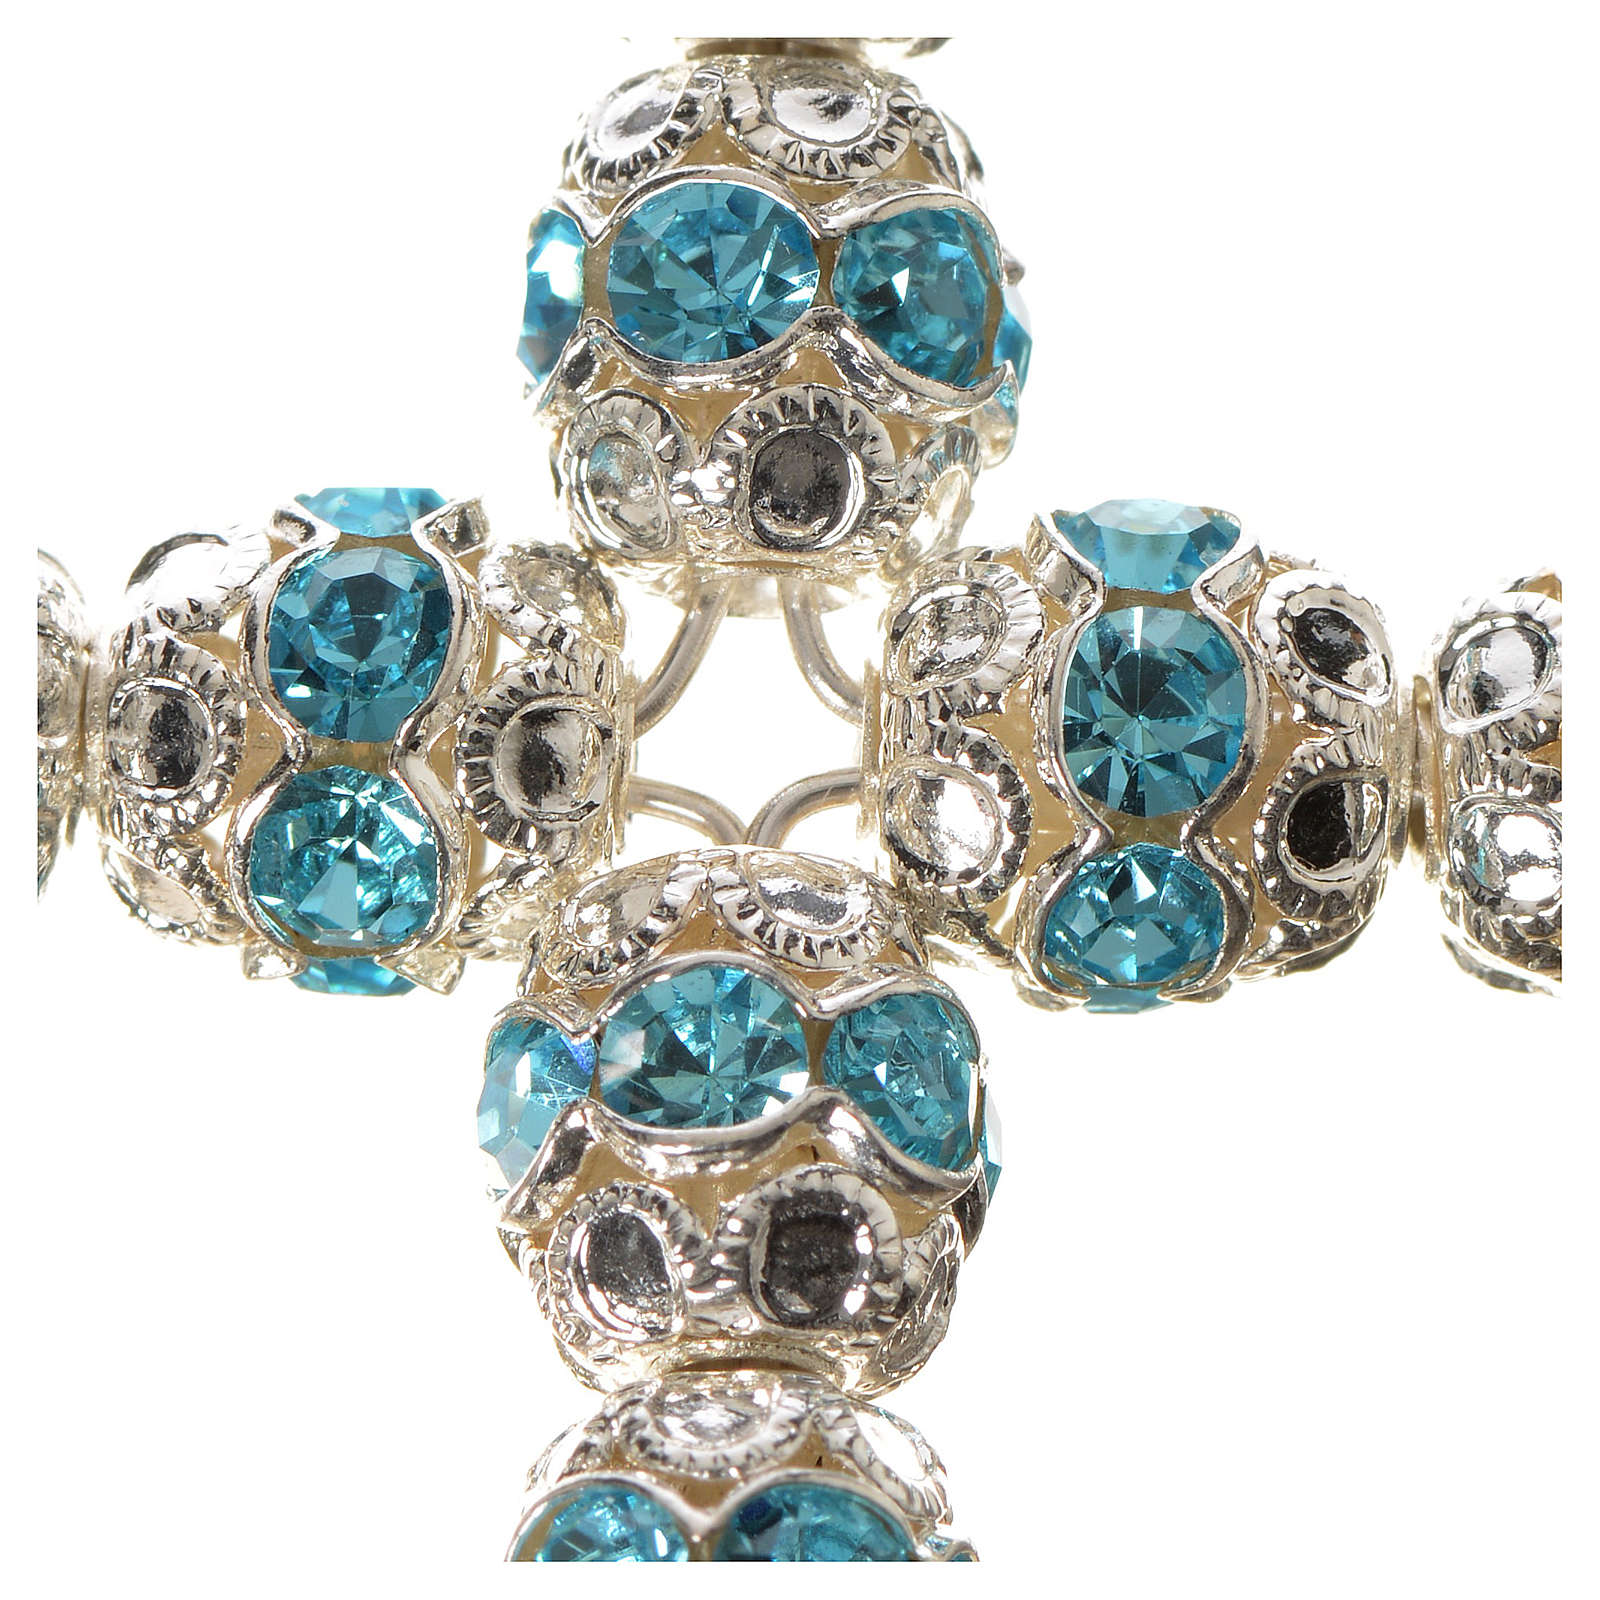 Croce argento e strass celeste coppiglie 4